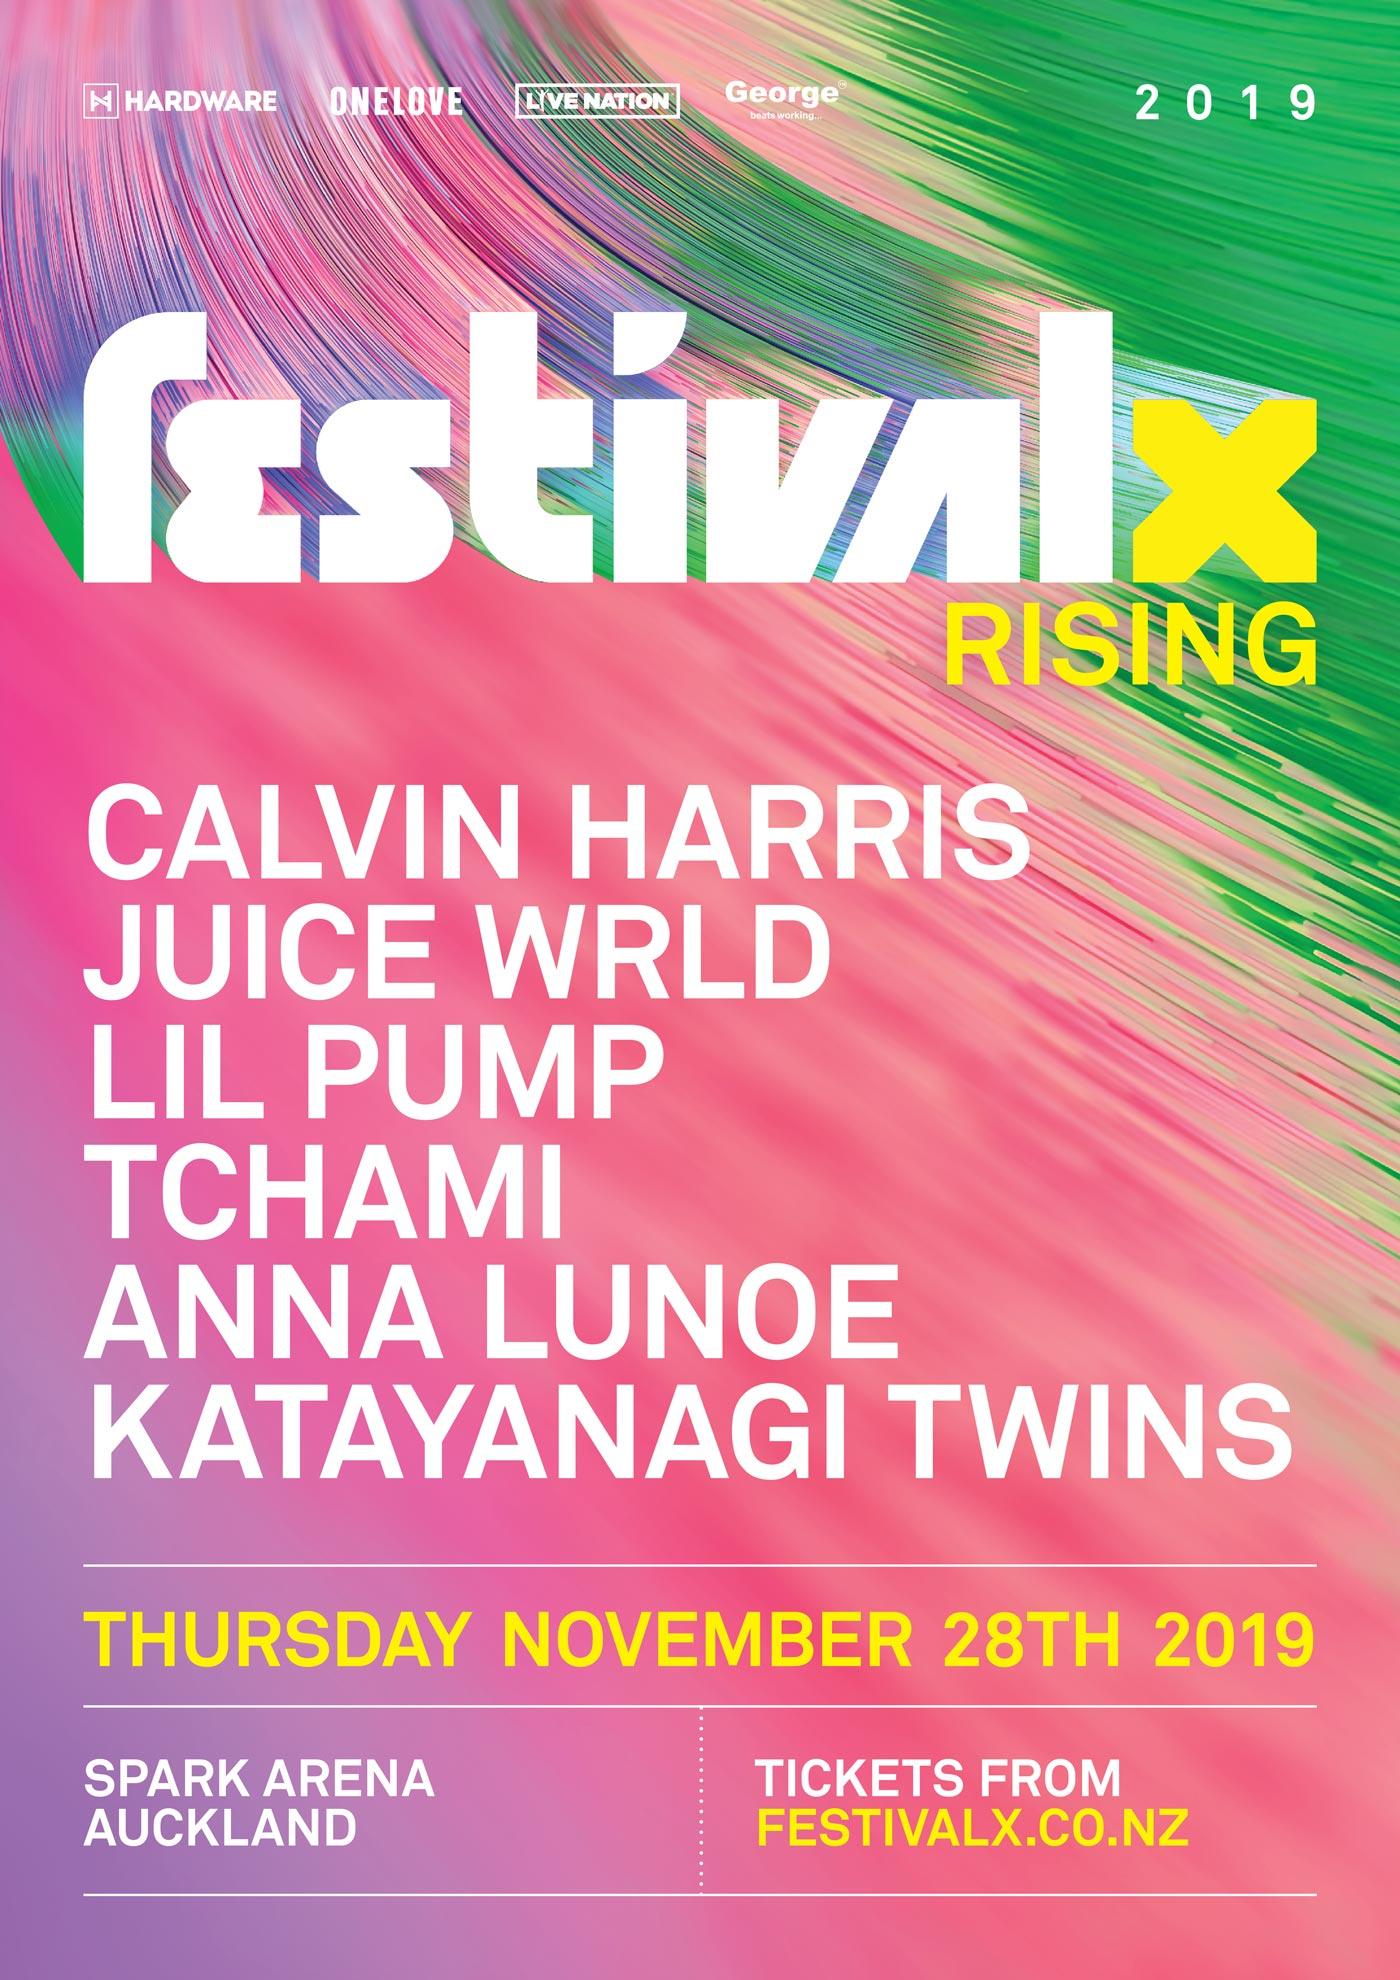 Festival X 2019 pres. Hardware, Onelove, Live Nation